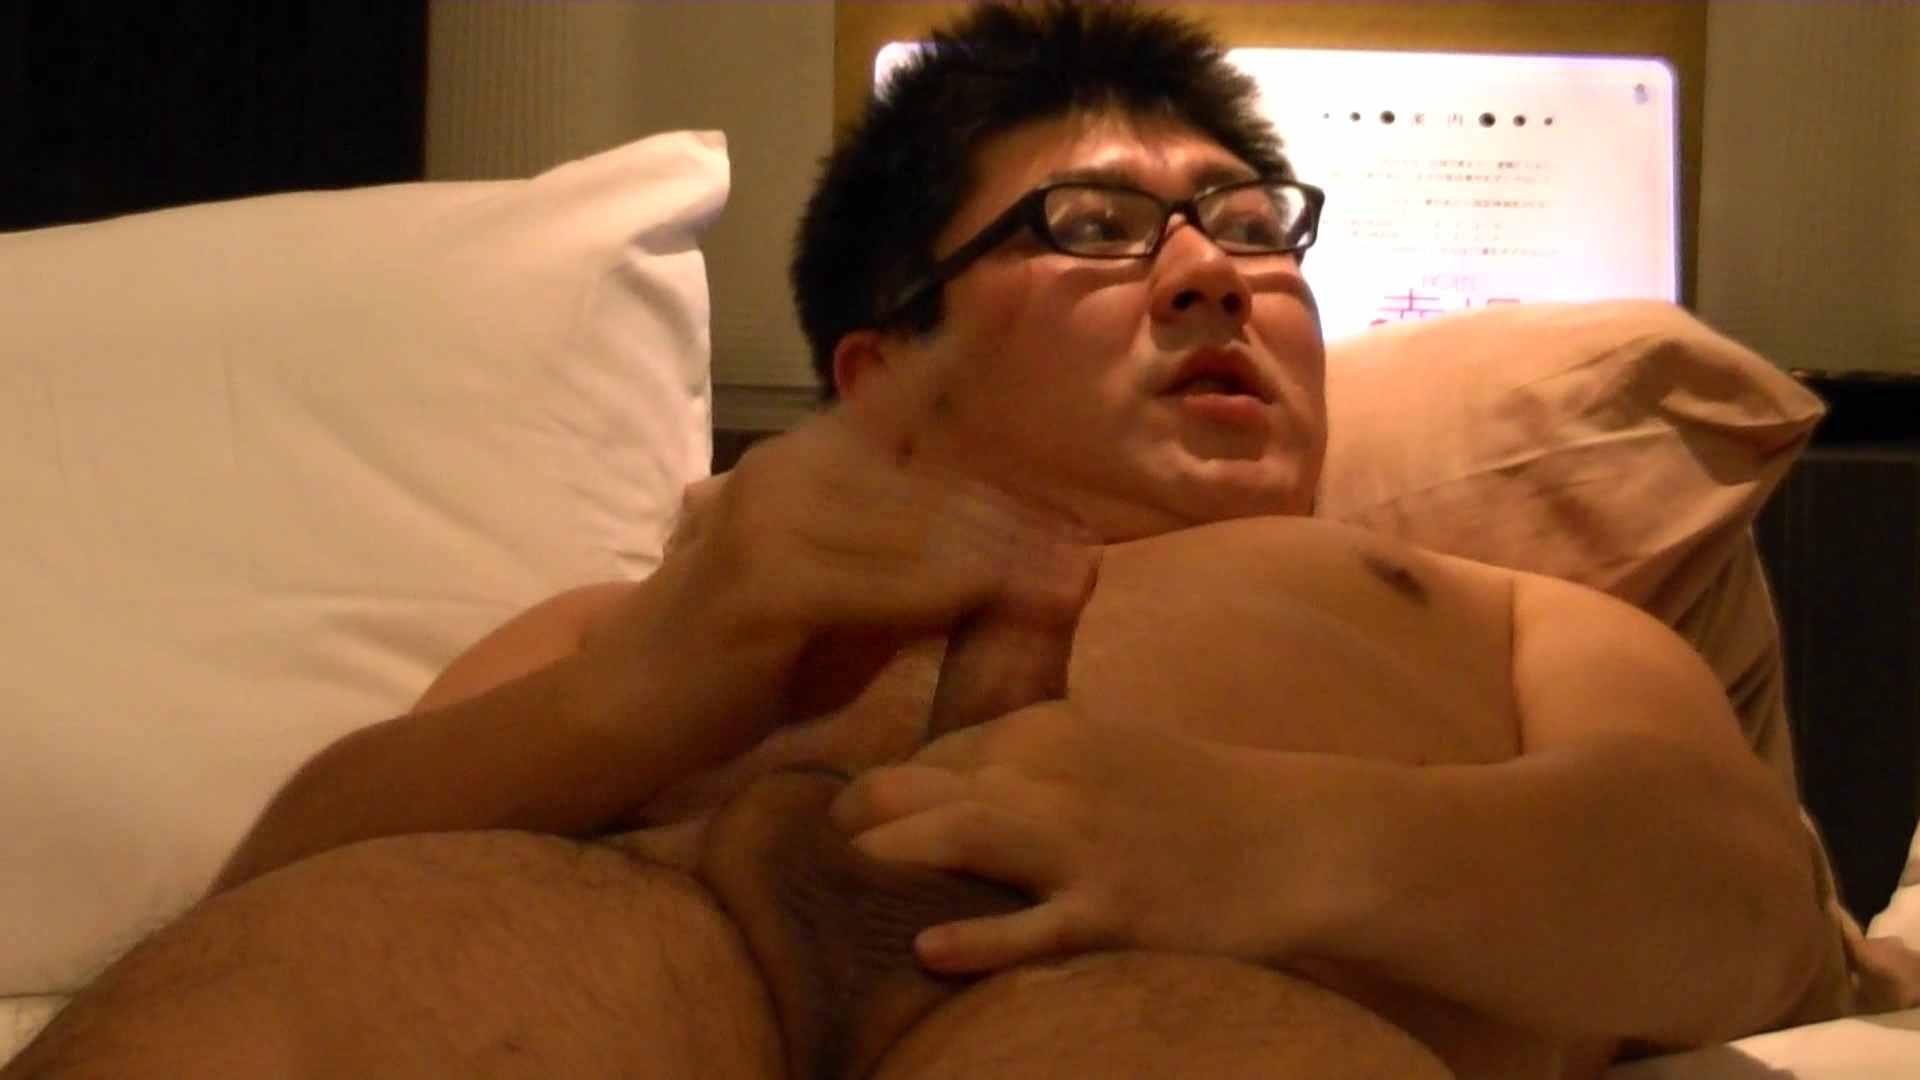 Mr.オナックスさん投稿!HD 貴方のオナニー三万円で撮影させてください。VOL.03 後編 完全無修正でお届け | オナニー特集  83pic 14